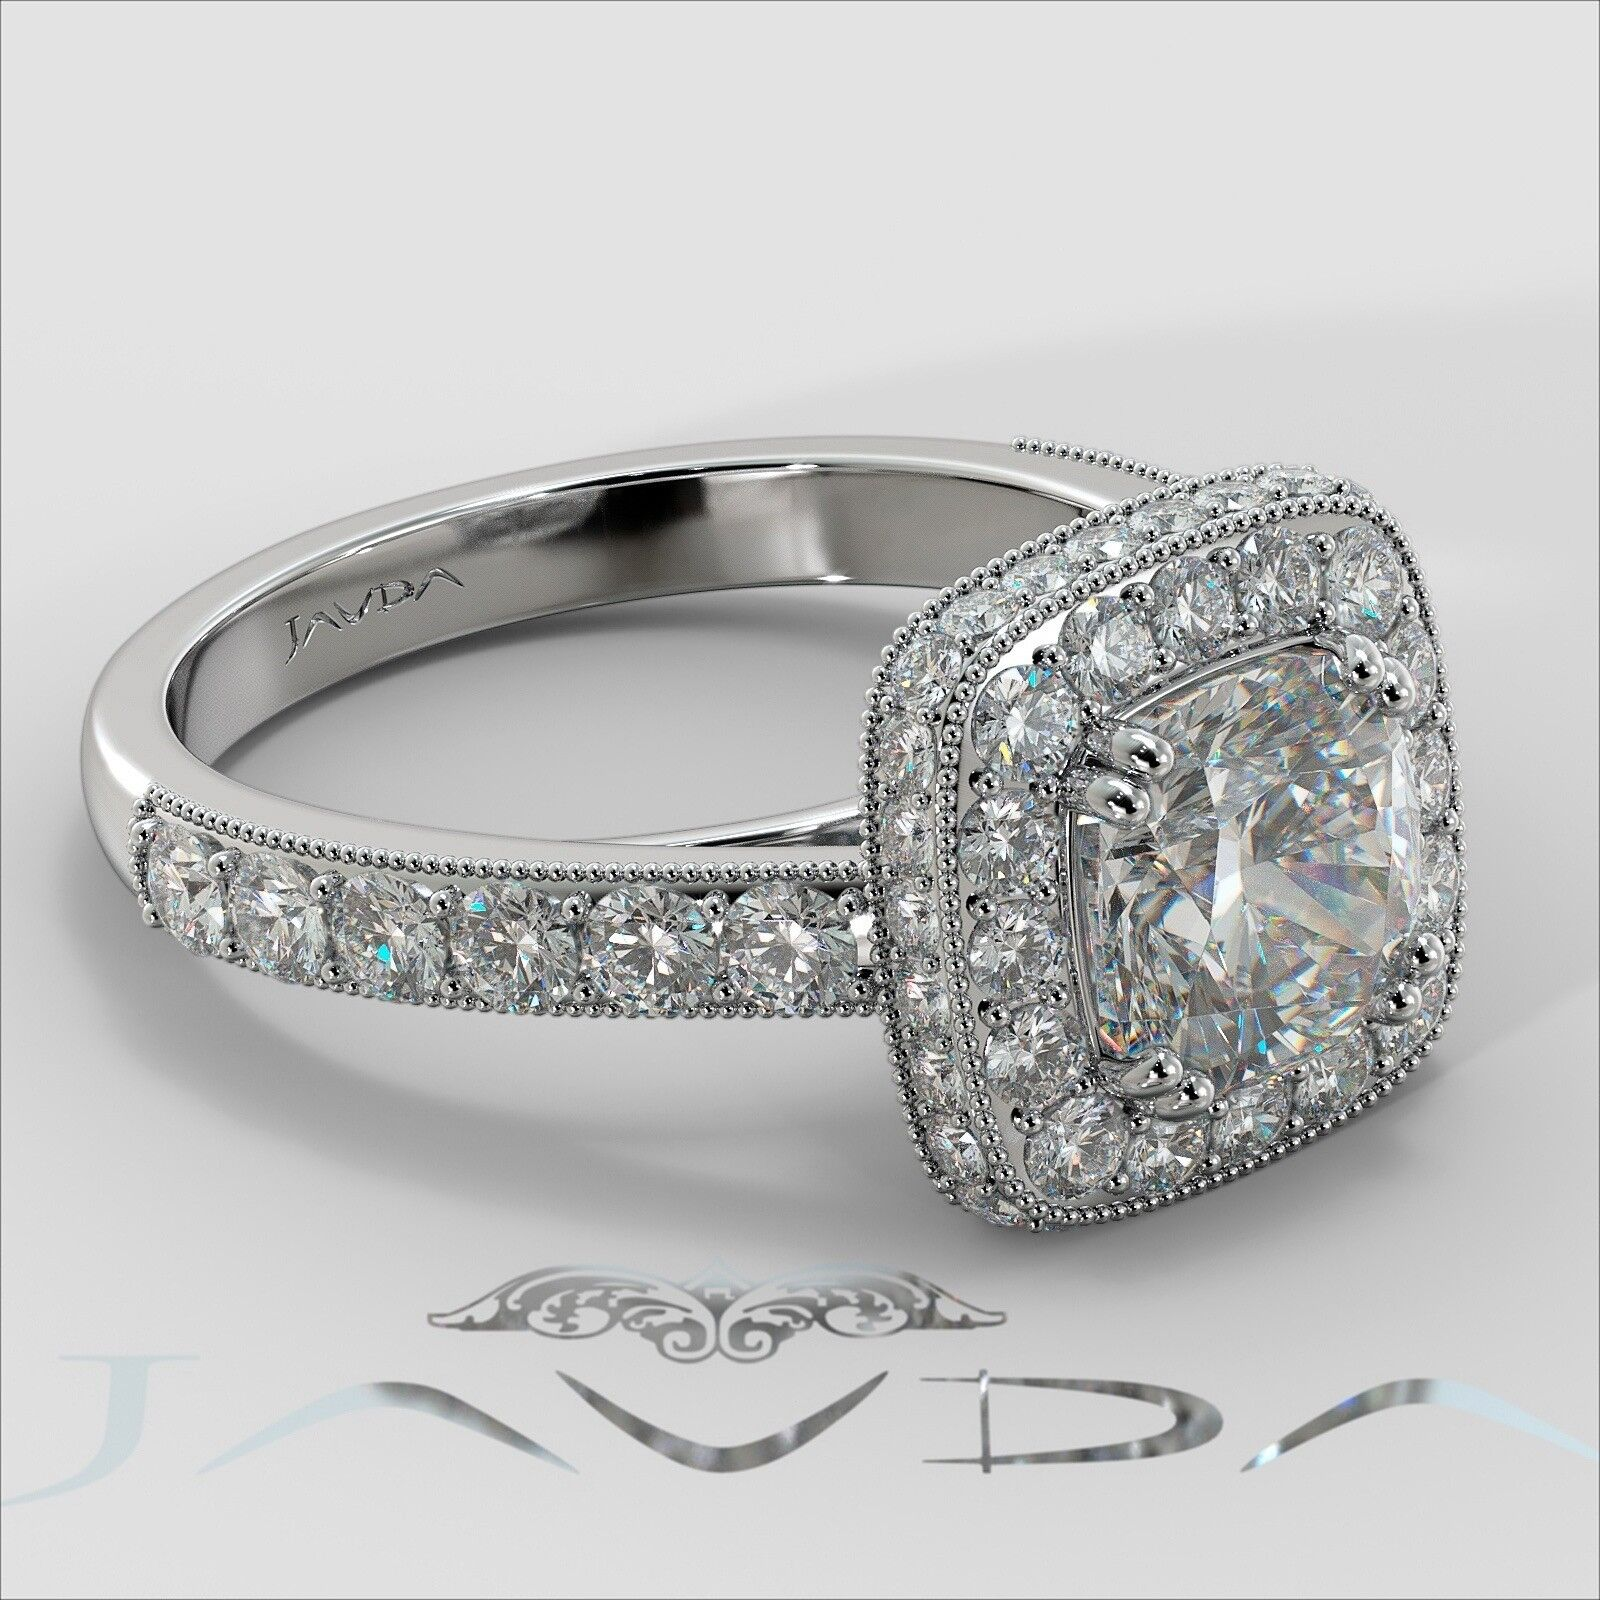 2.12ctw Milgrain Floral Basket Cushion Diamond Engagement Ring GIA I-SI2 W Gold 2